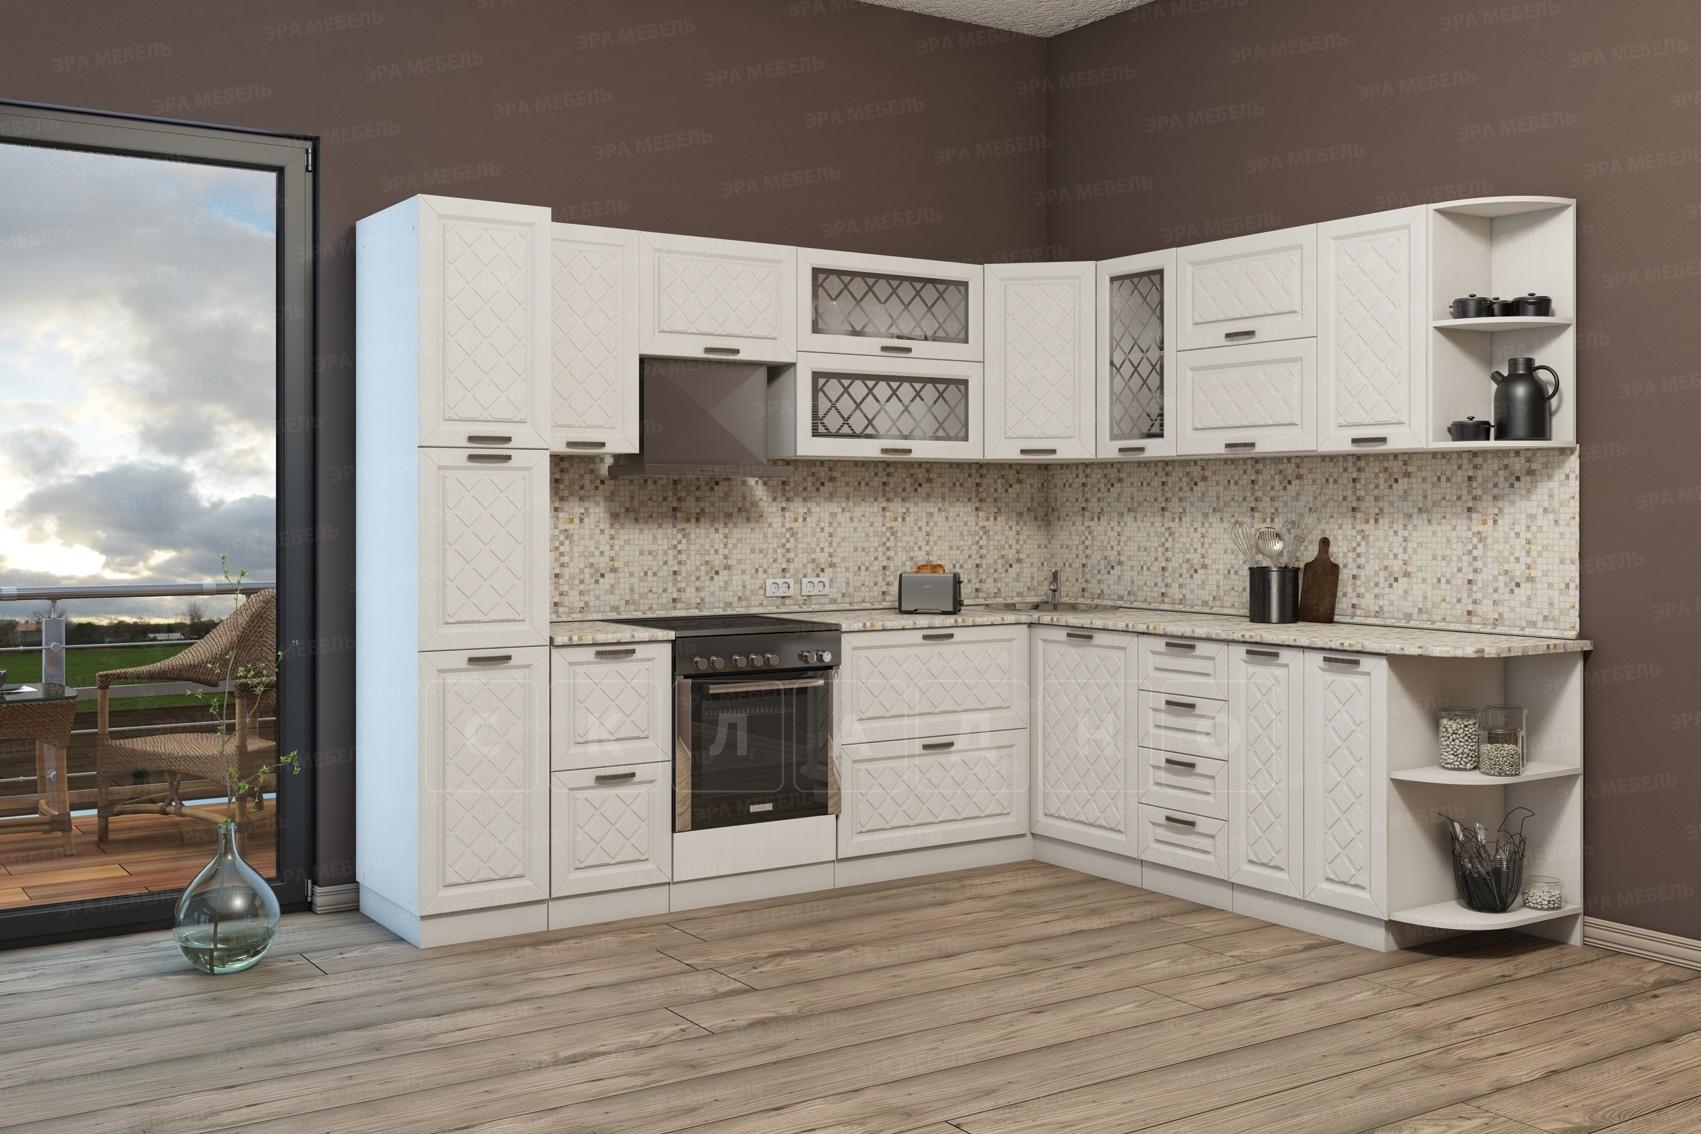 Кухня угловая Агава 2,3х2,8 м фото 1 | интернет-магазин Складно